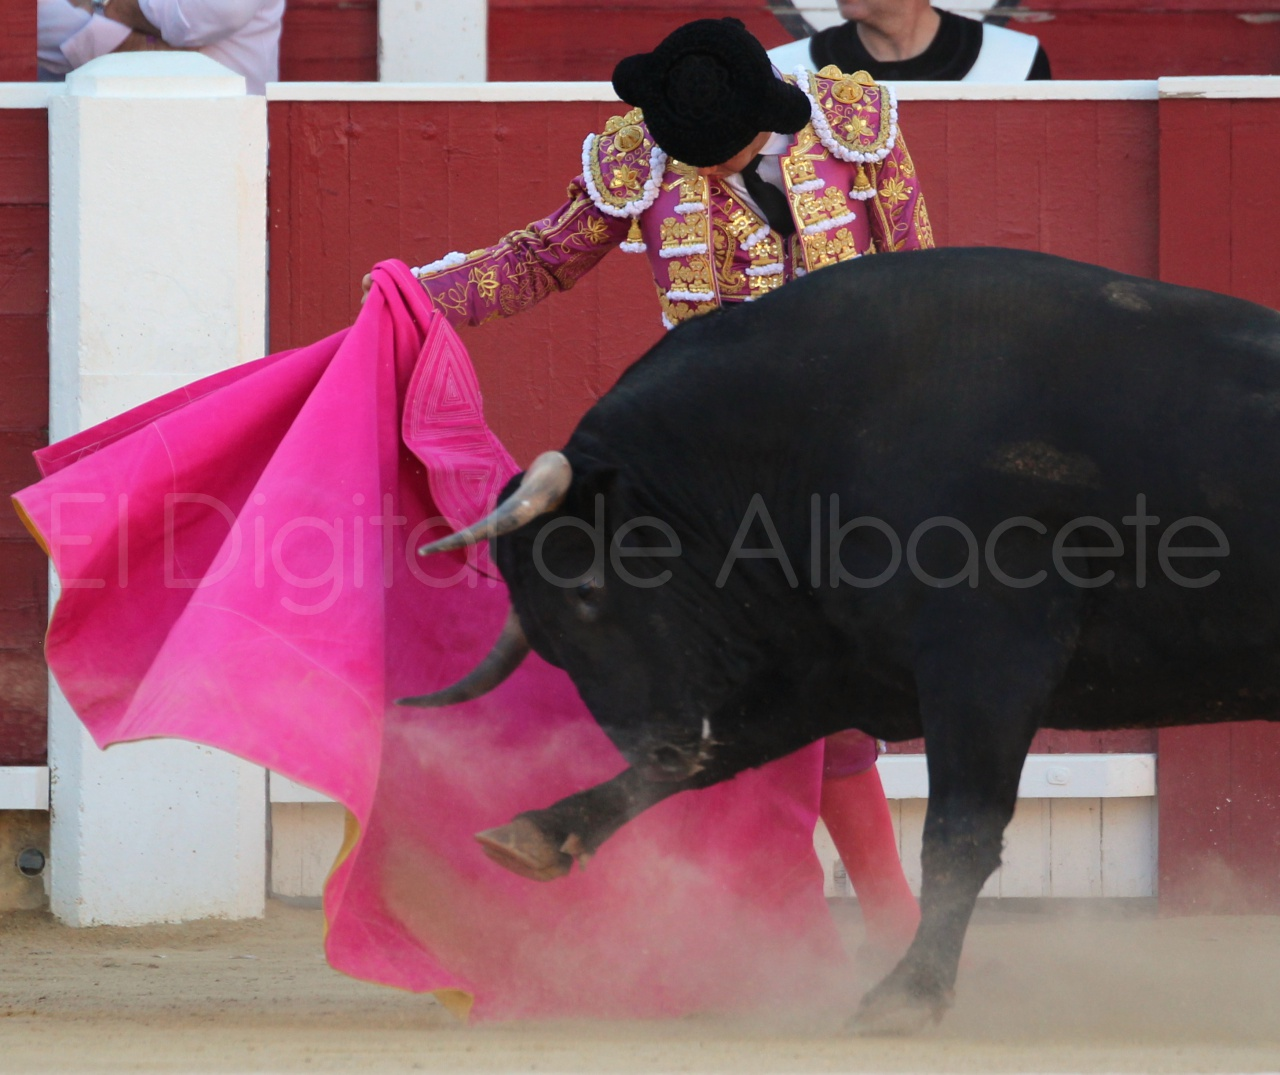 El Juli Lopez Simon y Garrido Feria Albacete 2015 toros  58